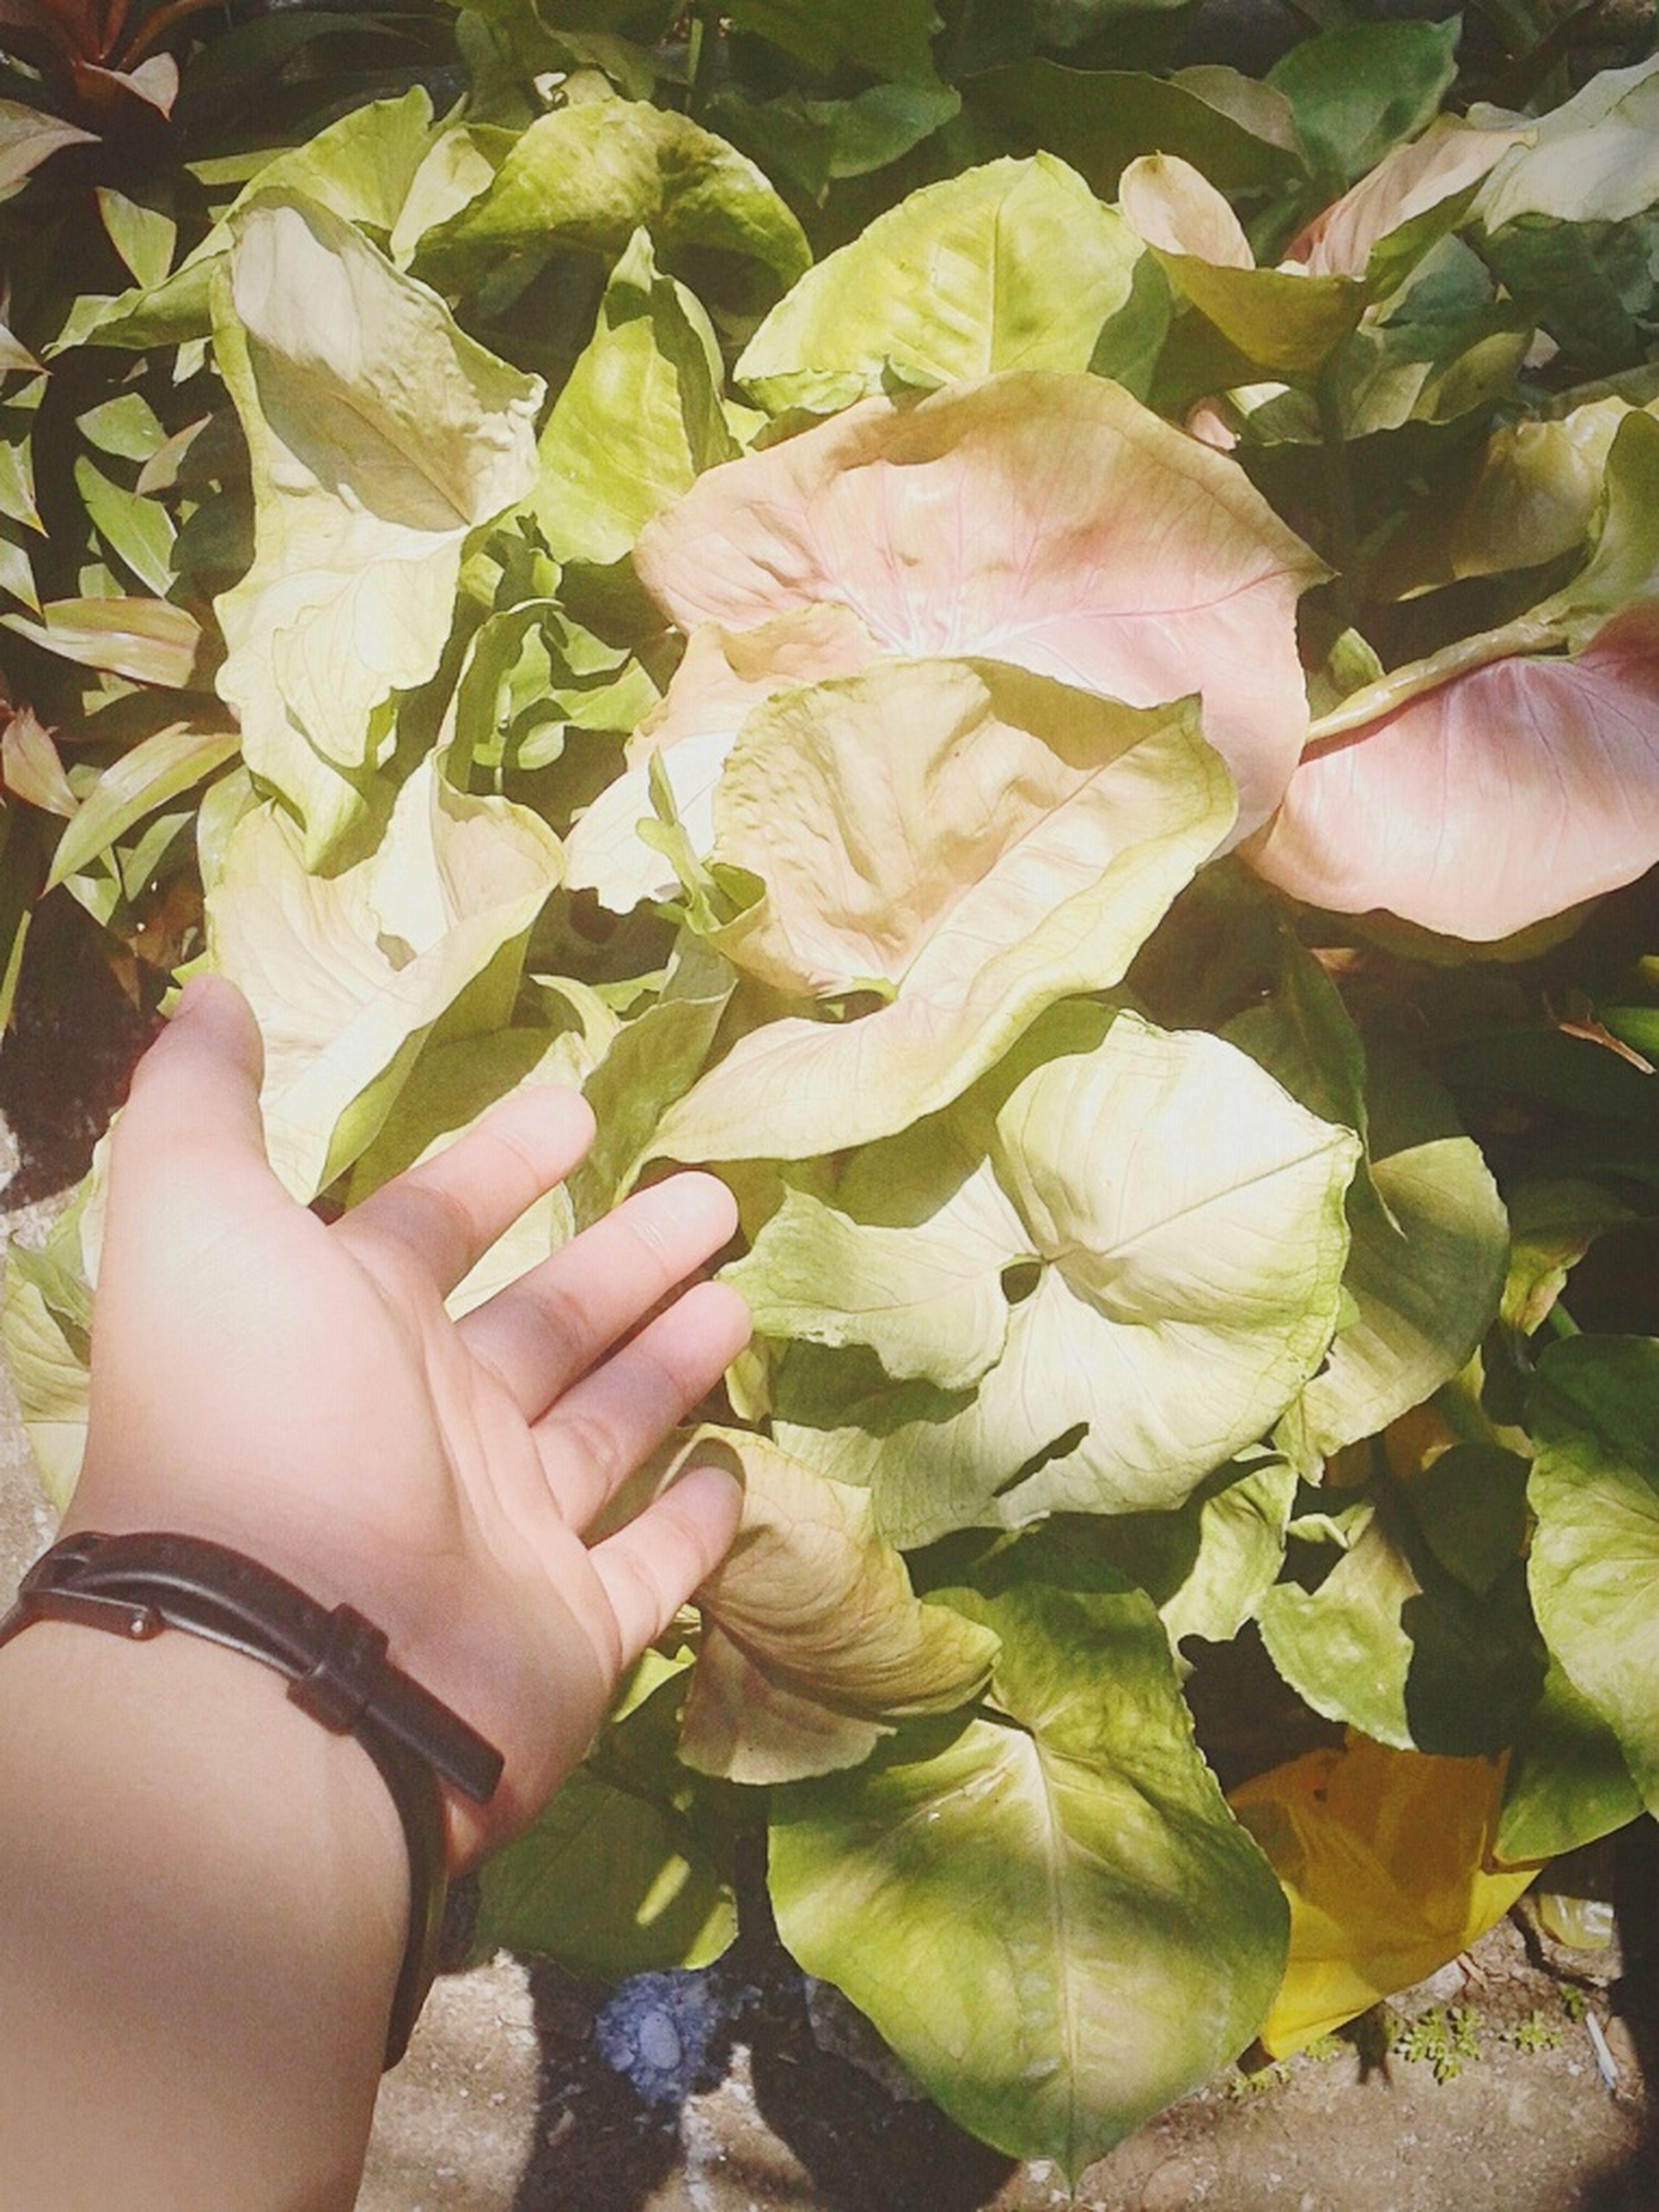 🍀🍀 EyeEm Nature Lover Leaf&hand Summer☀☀